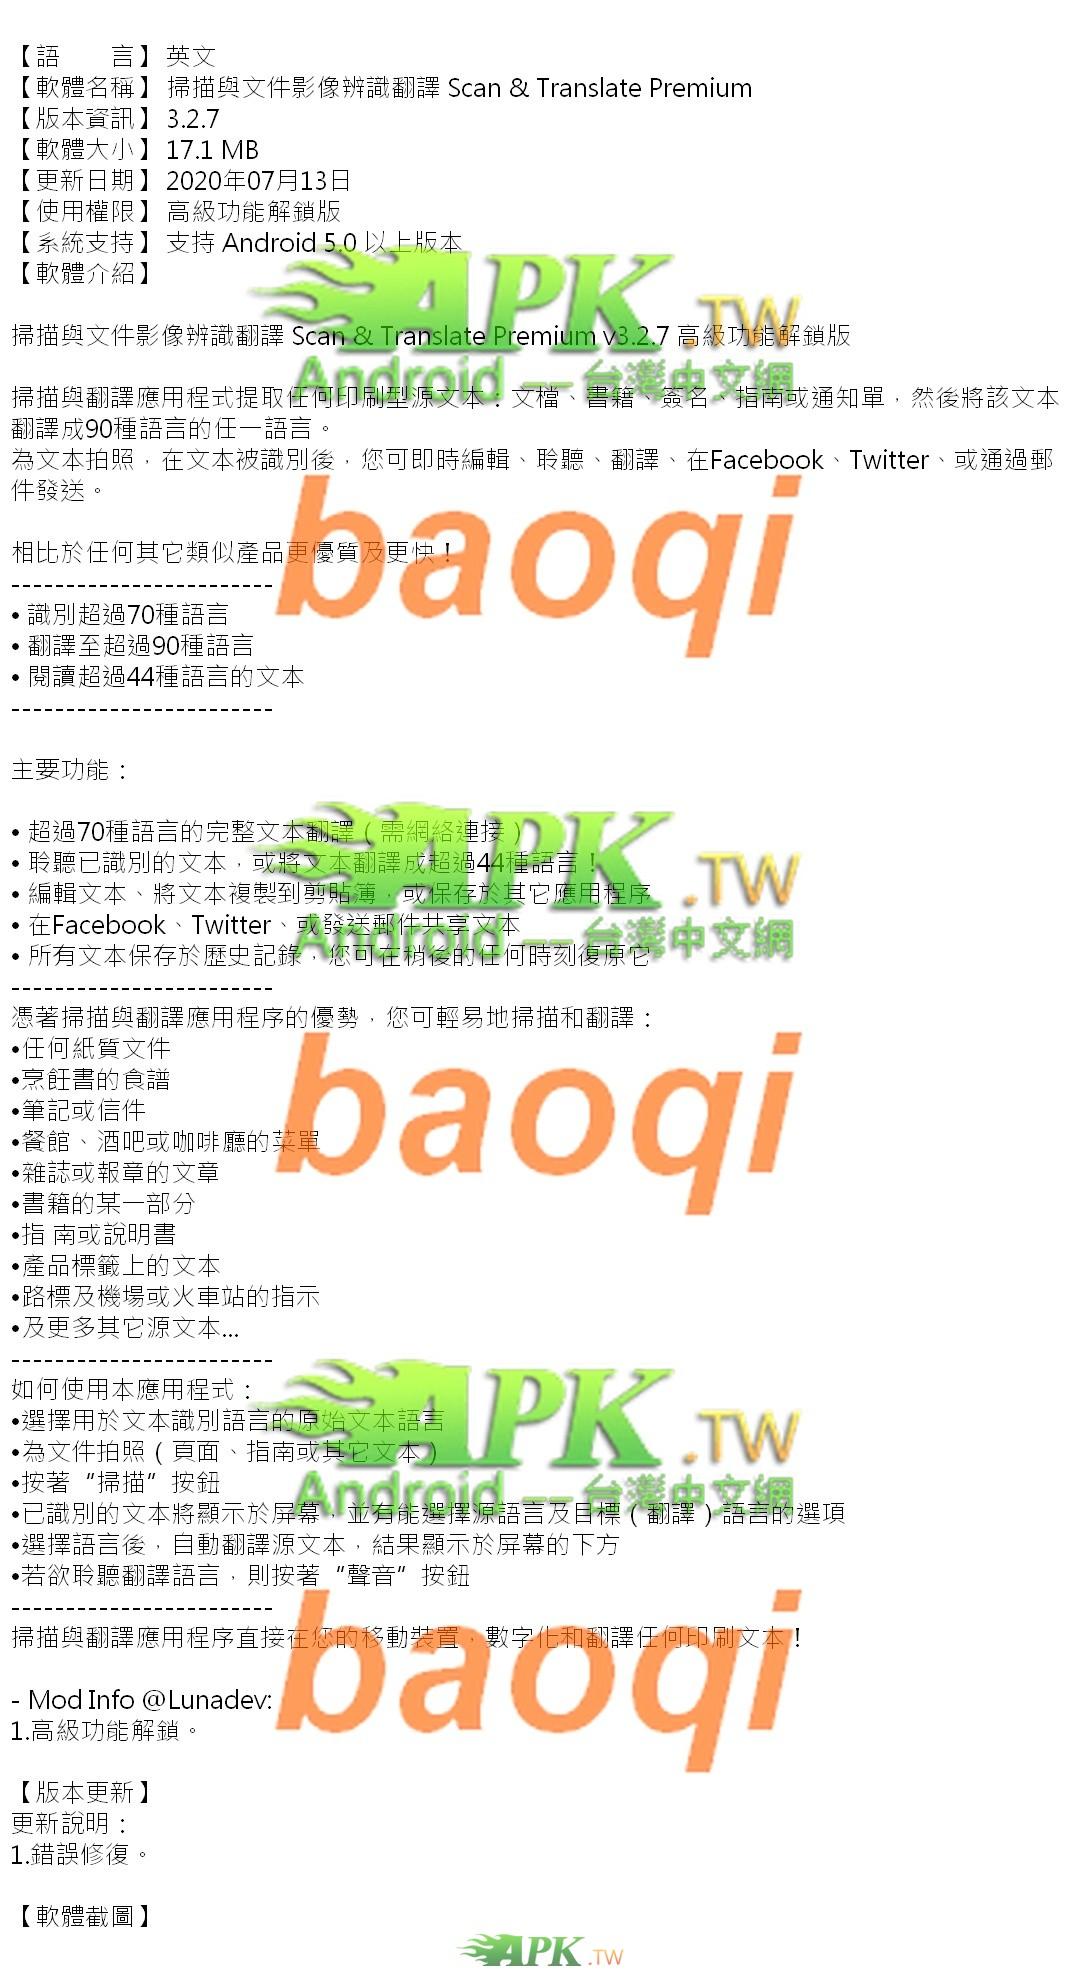 Scan_Translate_Premium_3.2.7_.jpg